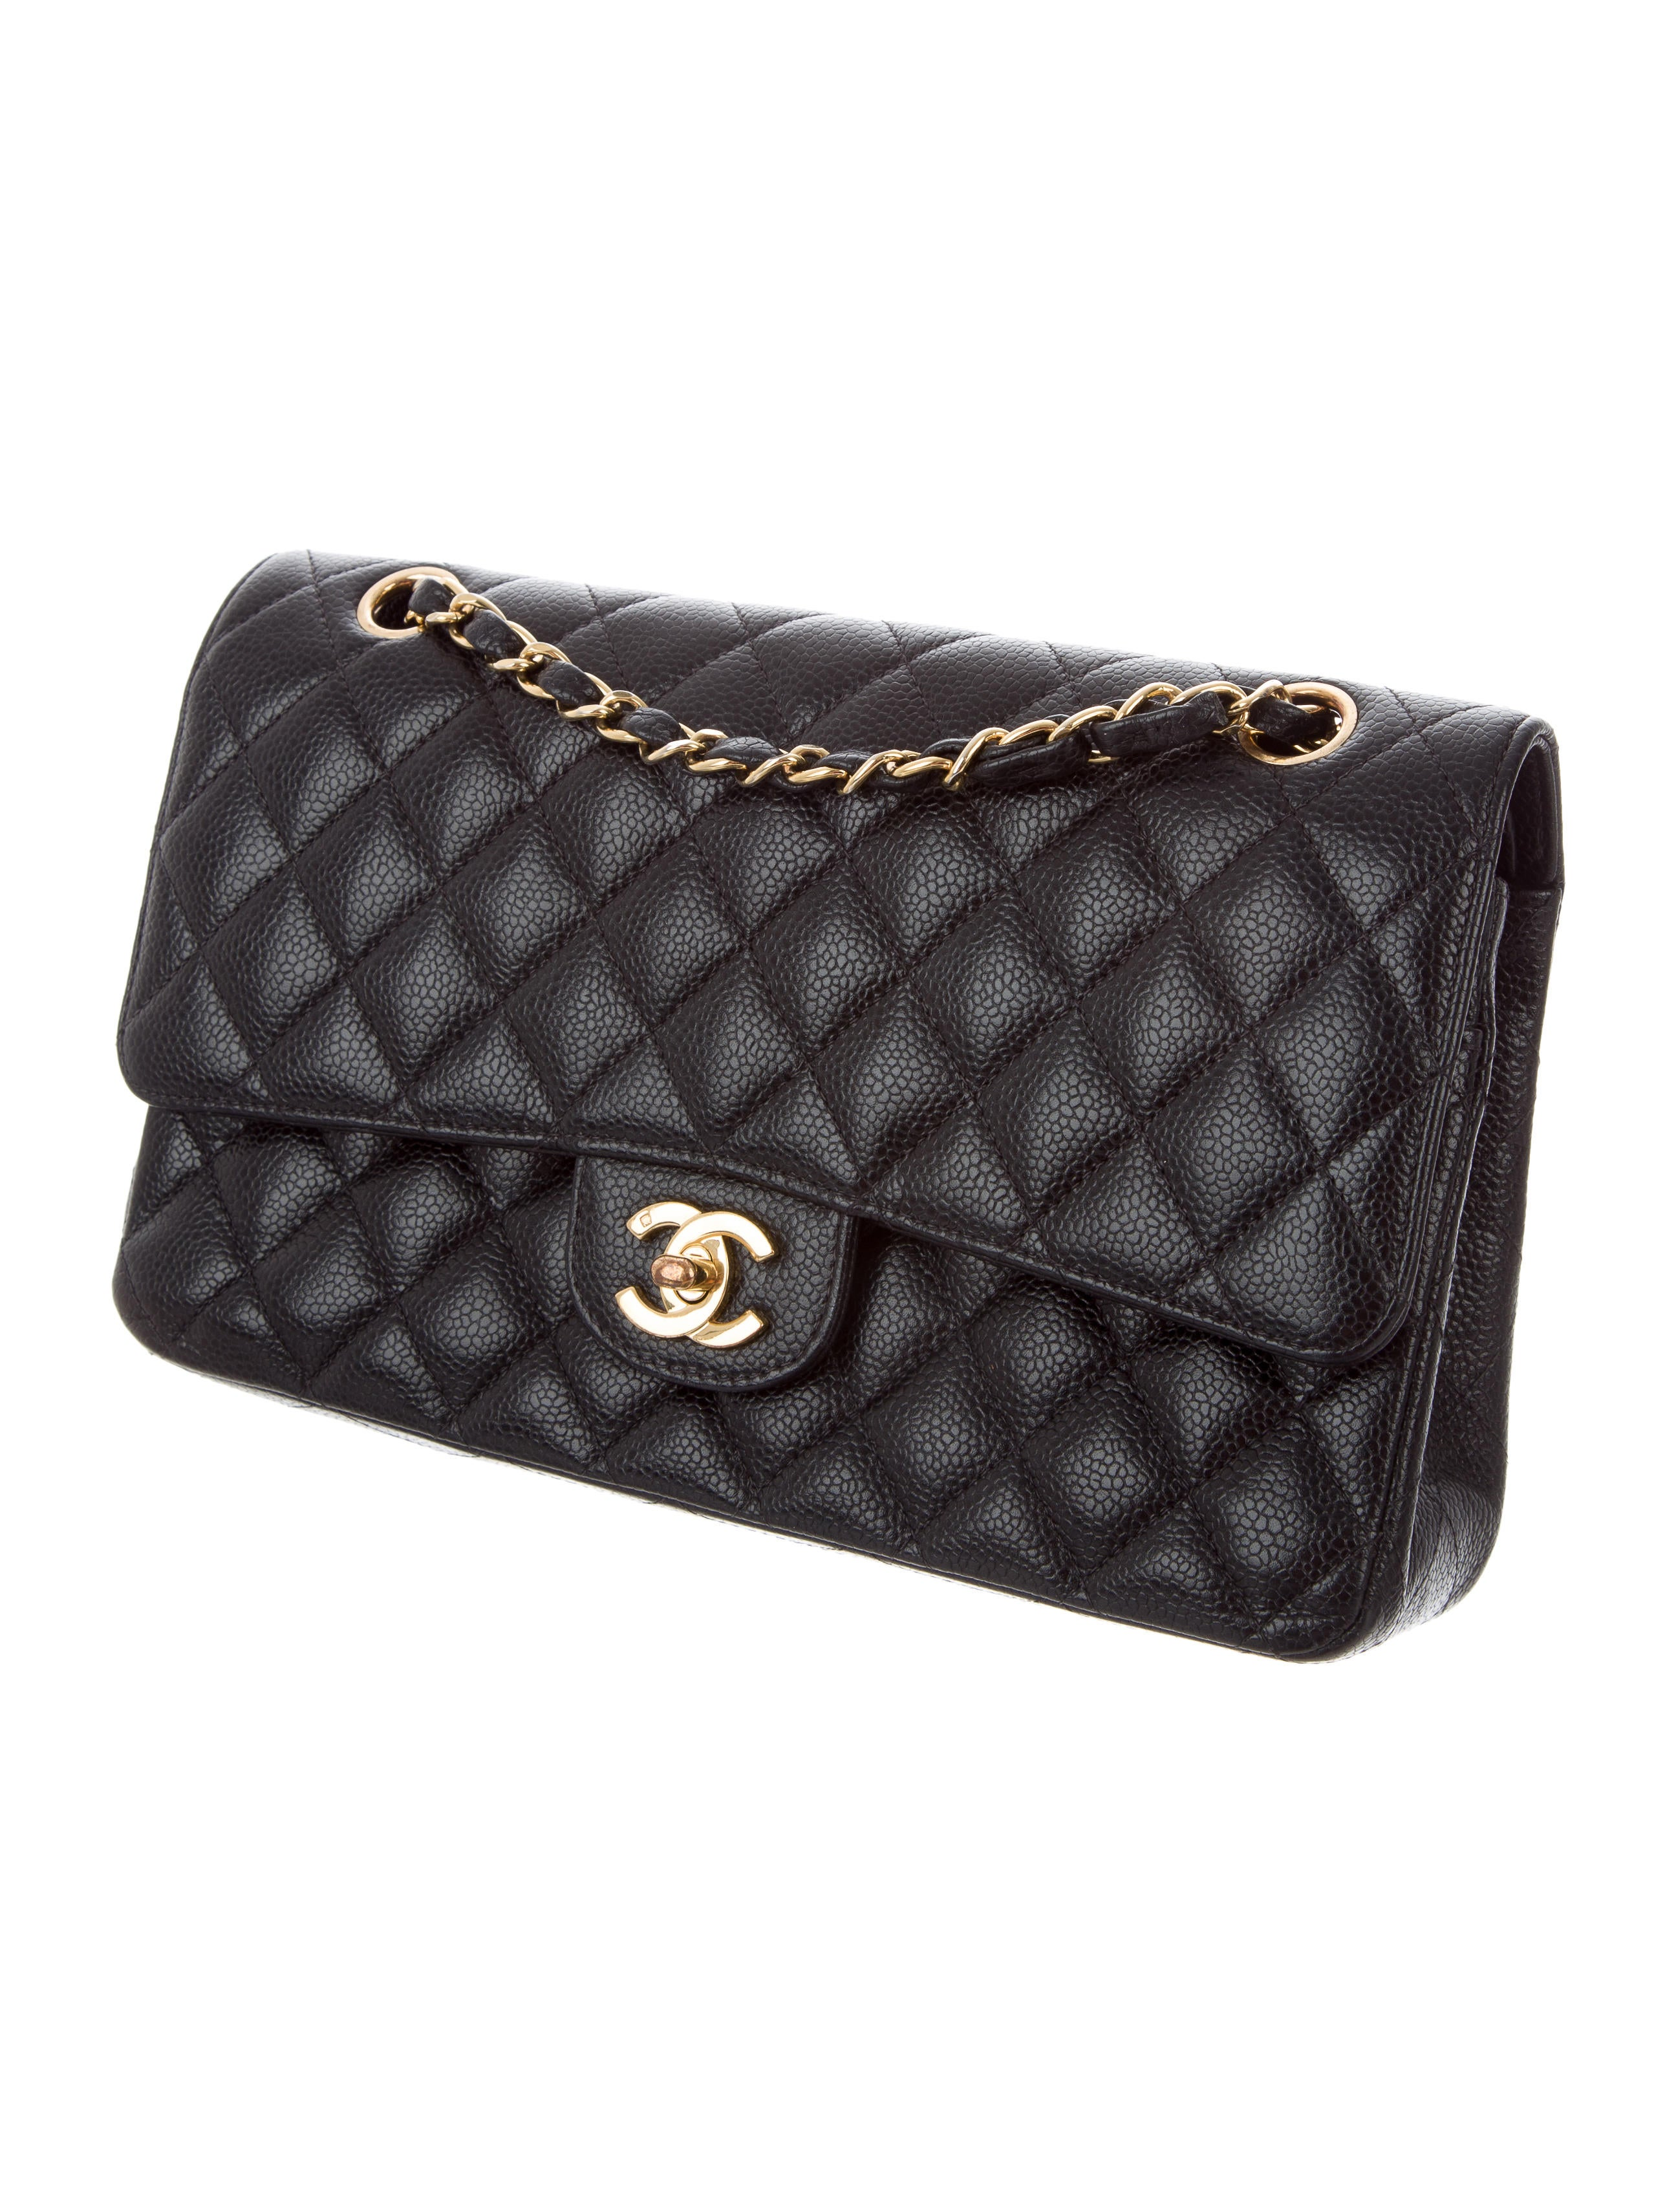 Enlarged Chanel Classic Medium Double Flap Bag Handbags